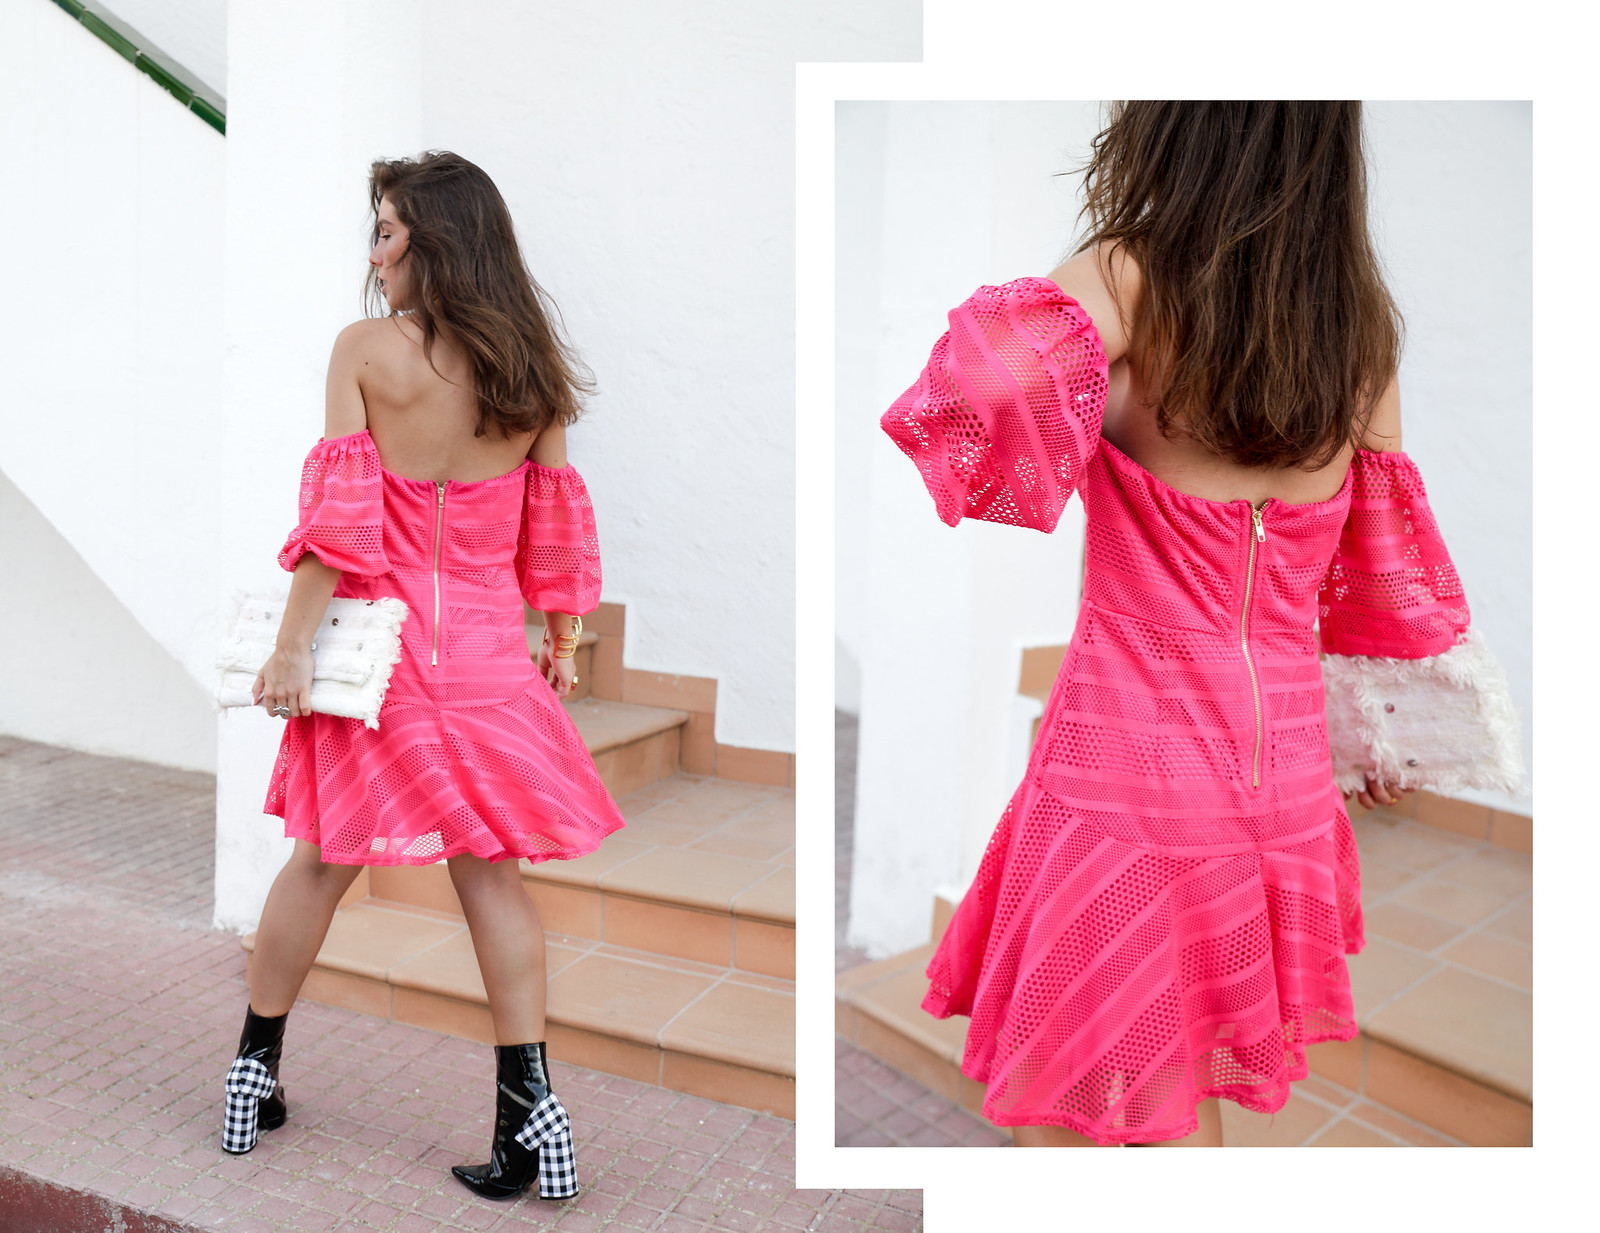 010_vestido_rosa_off_shoulder_danity_paris_pink_dress_theguestgirl_outfit_boots_vichy_trend_alert